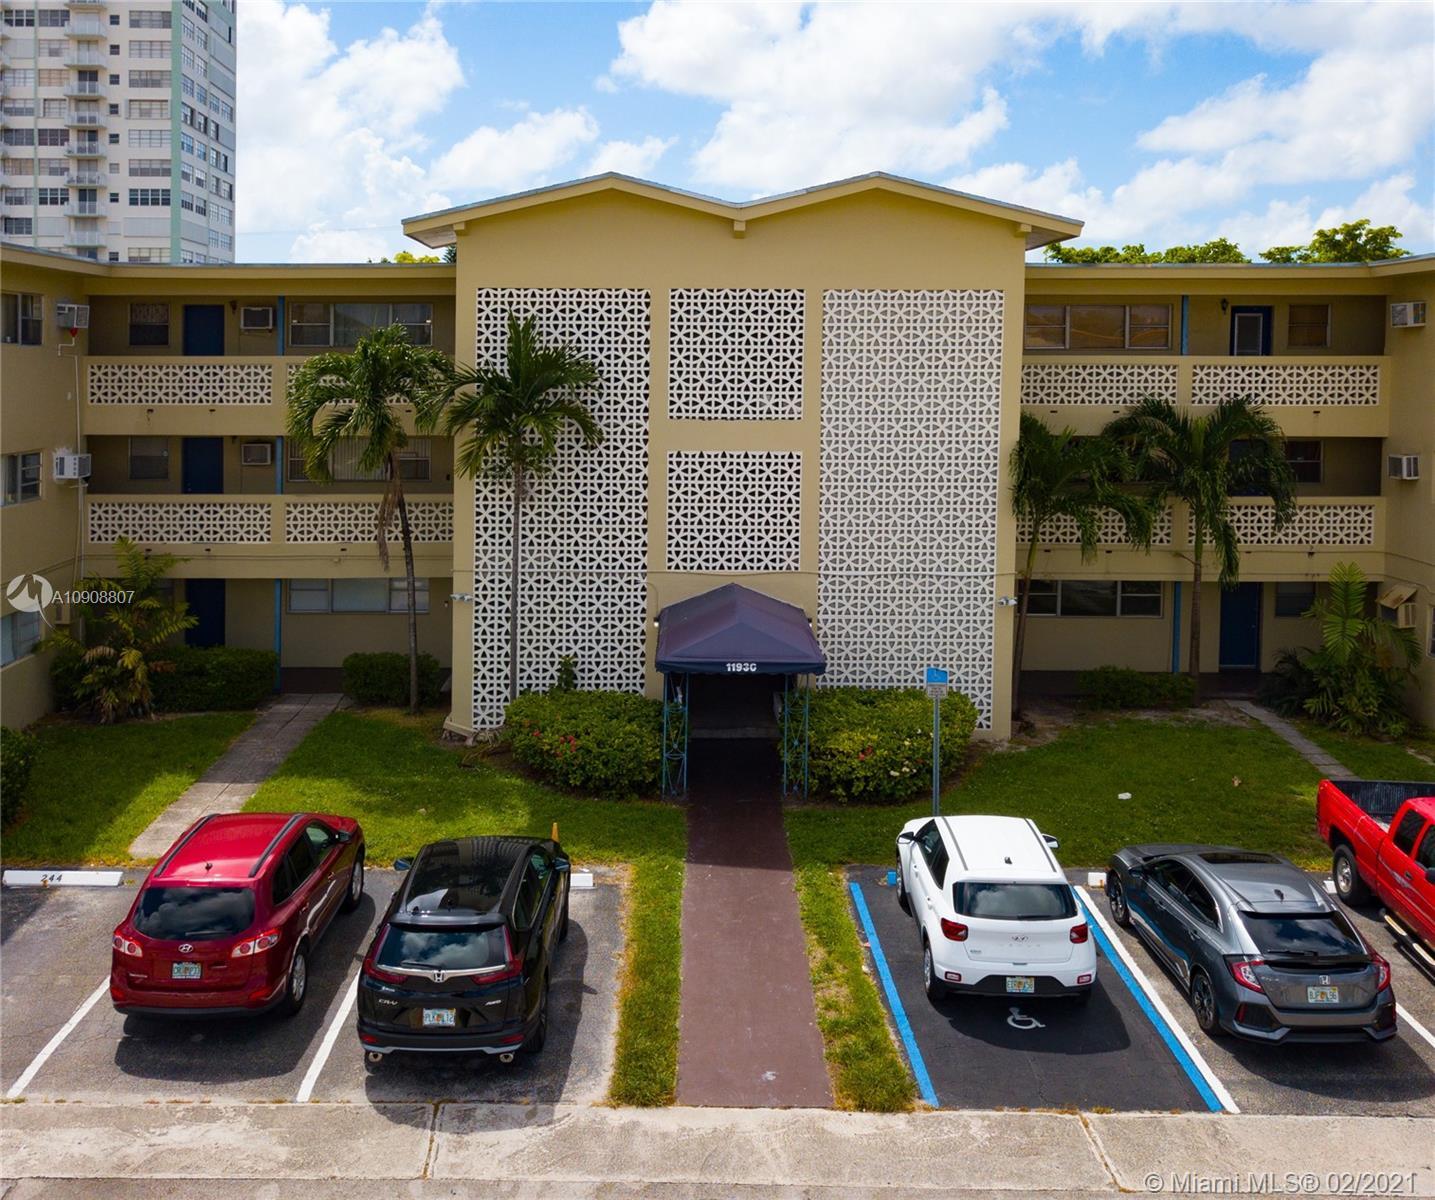 Unit , North Miami, Florida 33181